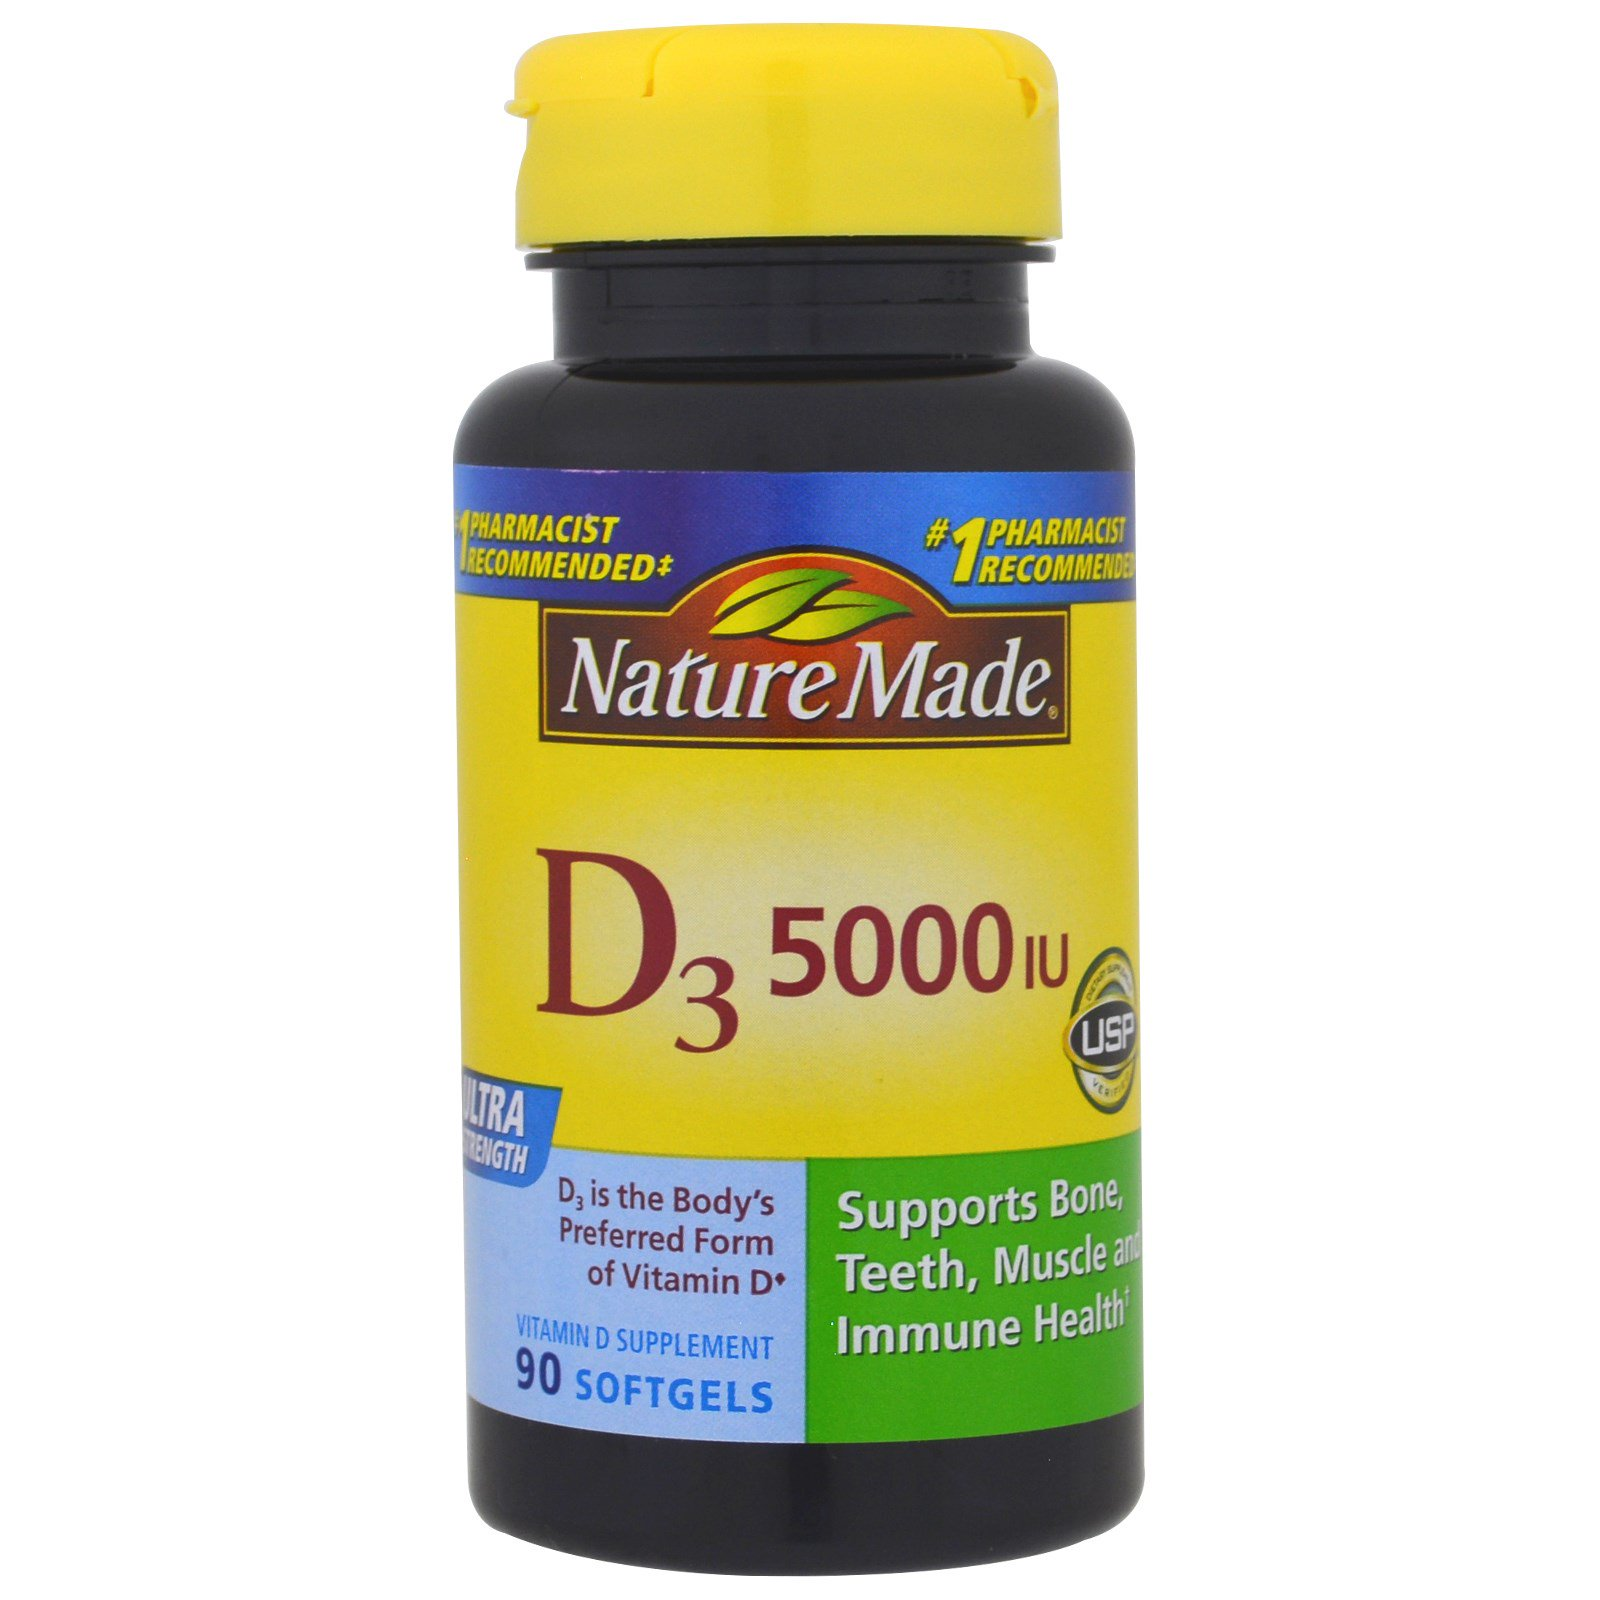 Nature Made, D3, Ультра сила, 5000 МЕ, 90 капсул